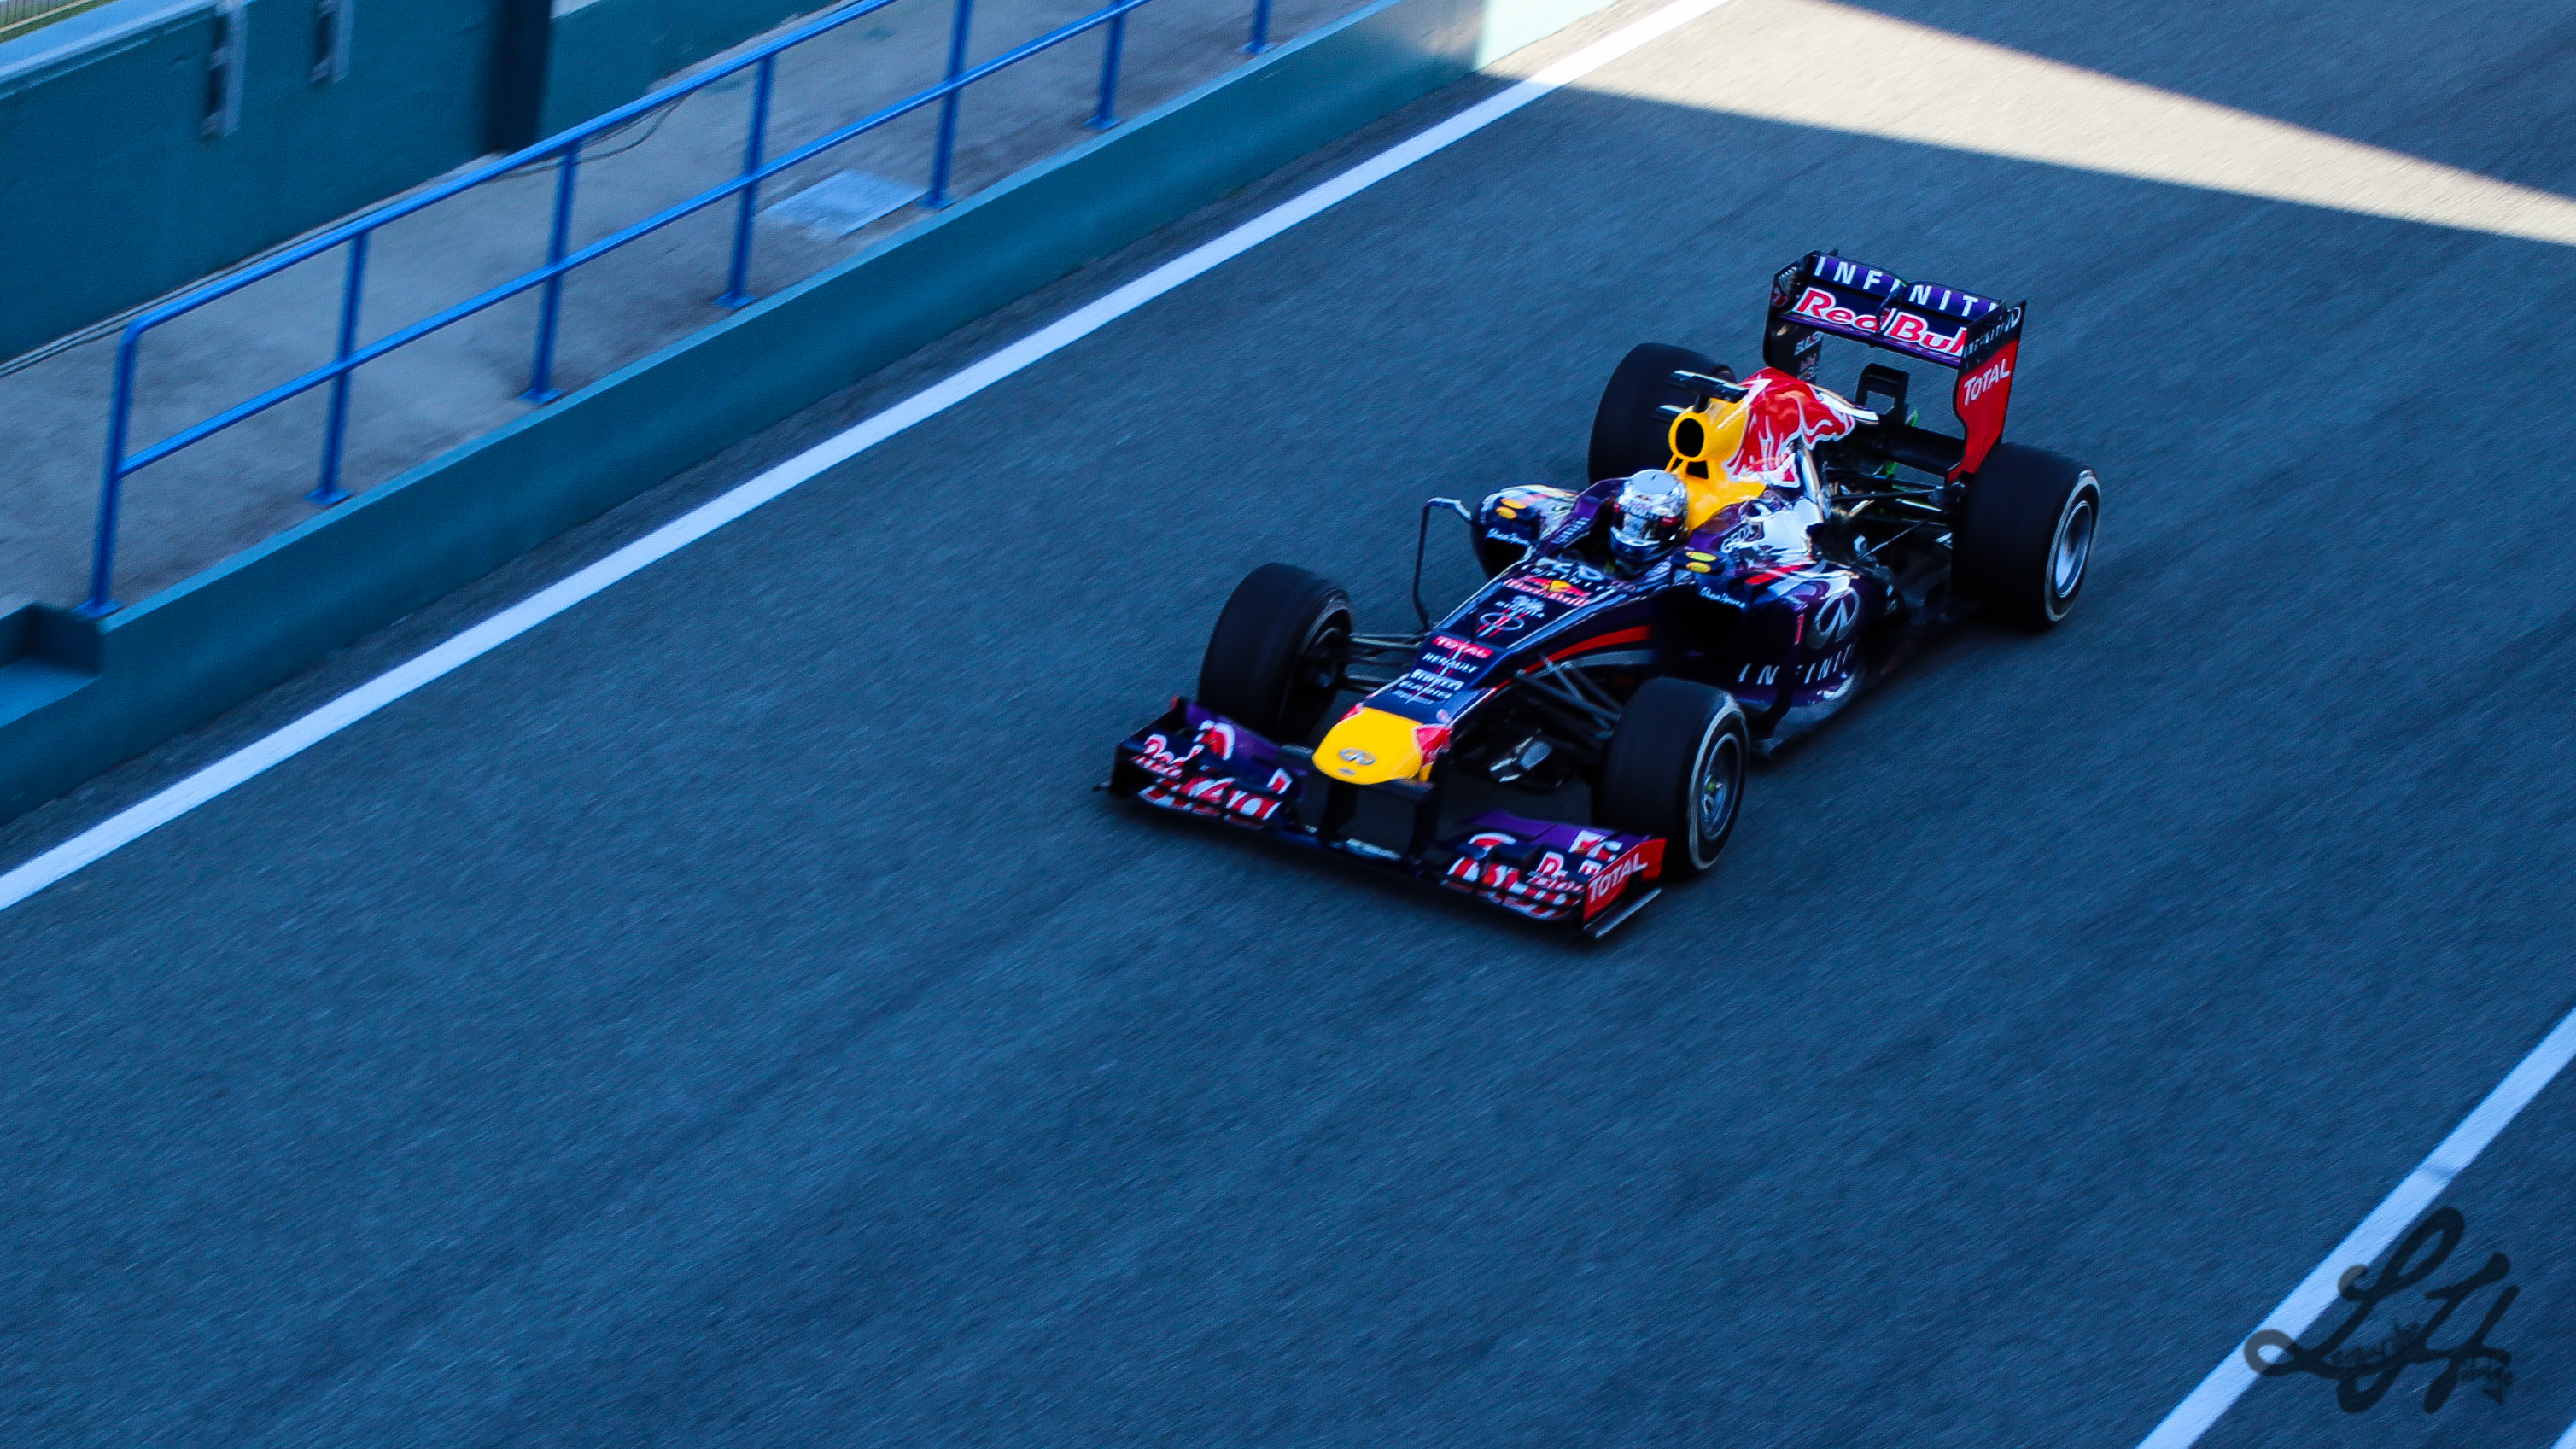 Archivored Bull Rb9 Vettel F1 Jerez 2013jpg Wikipedia